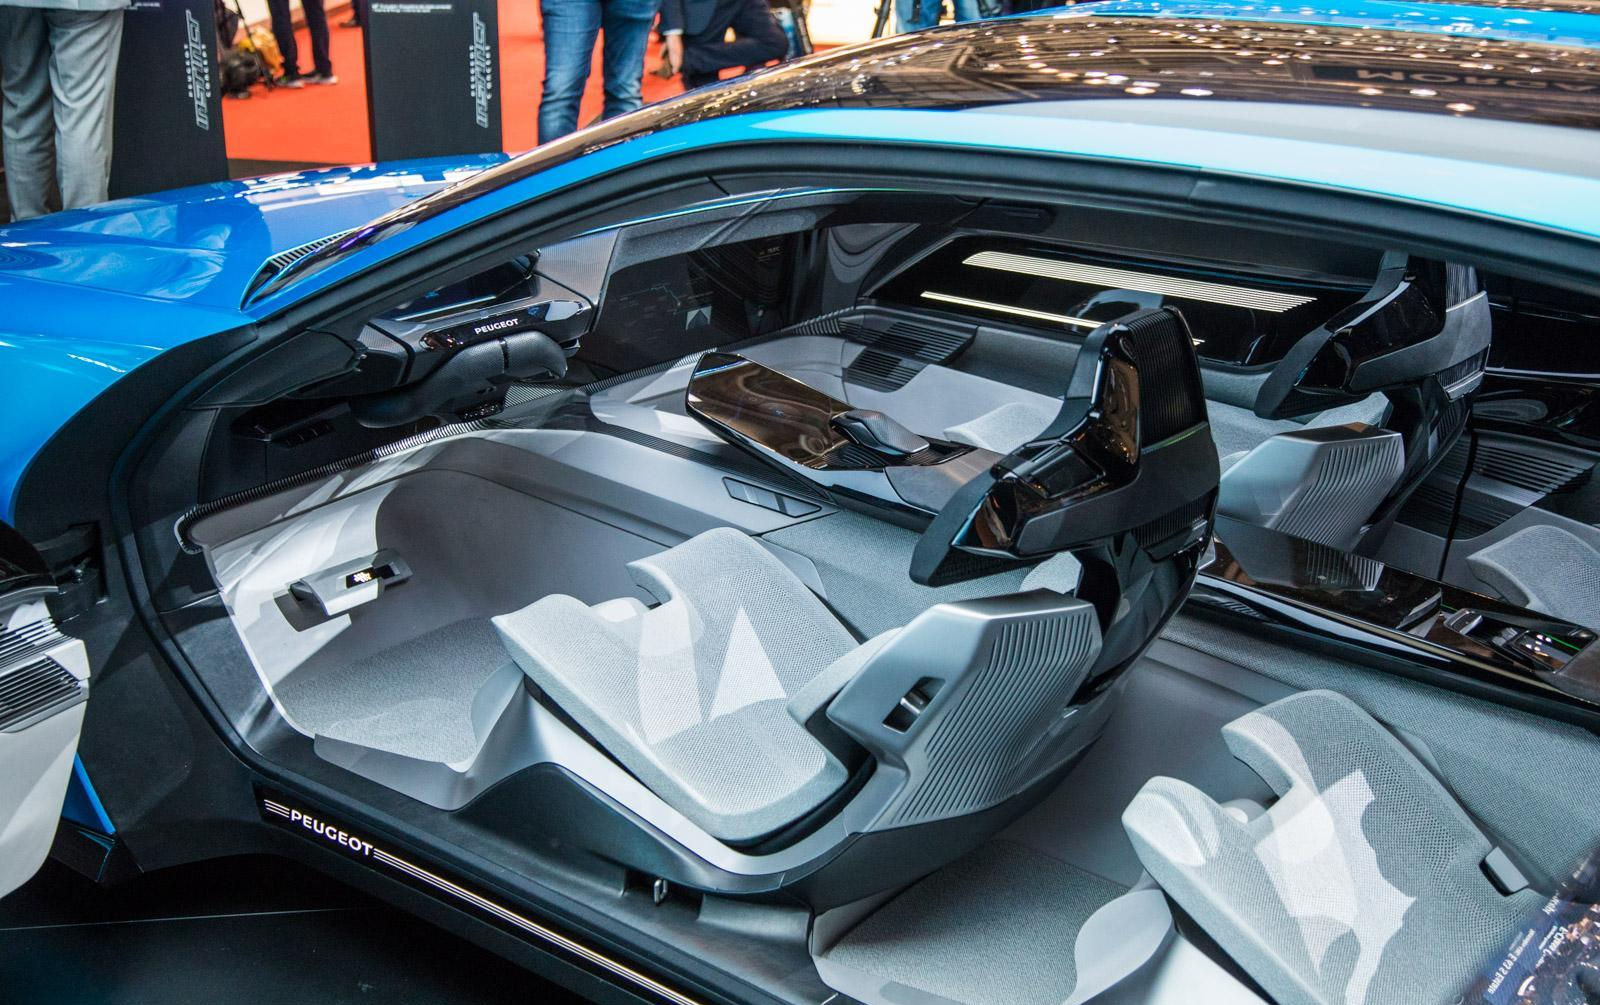 Peugeot-instinct-concept-011